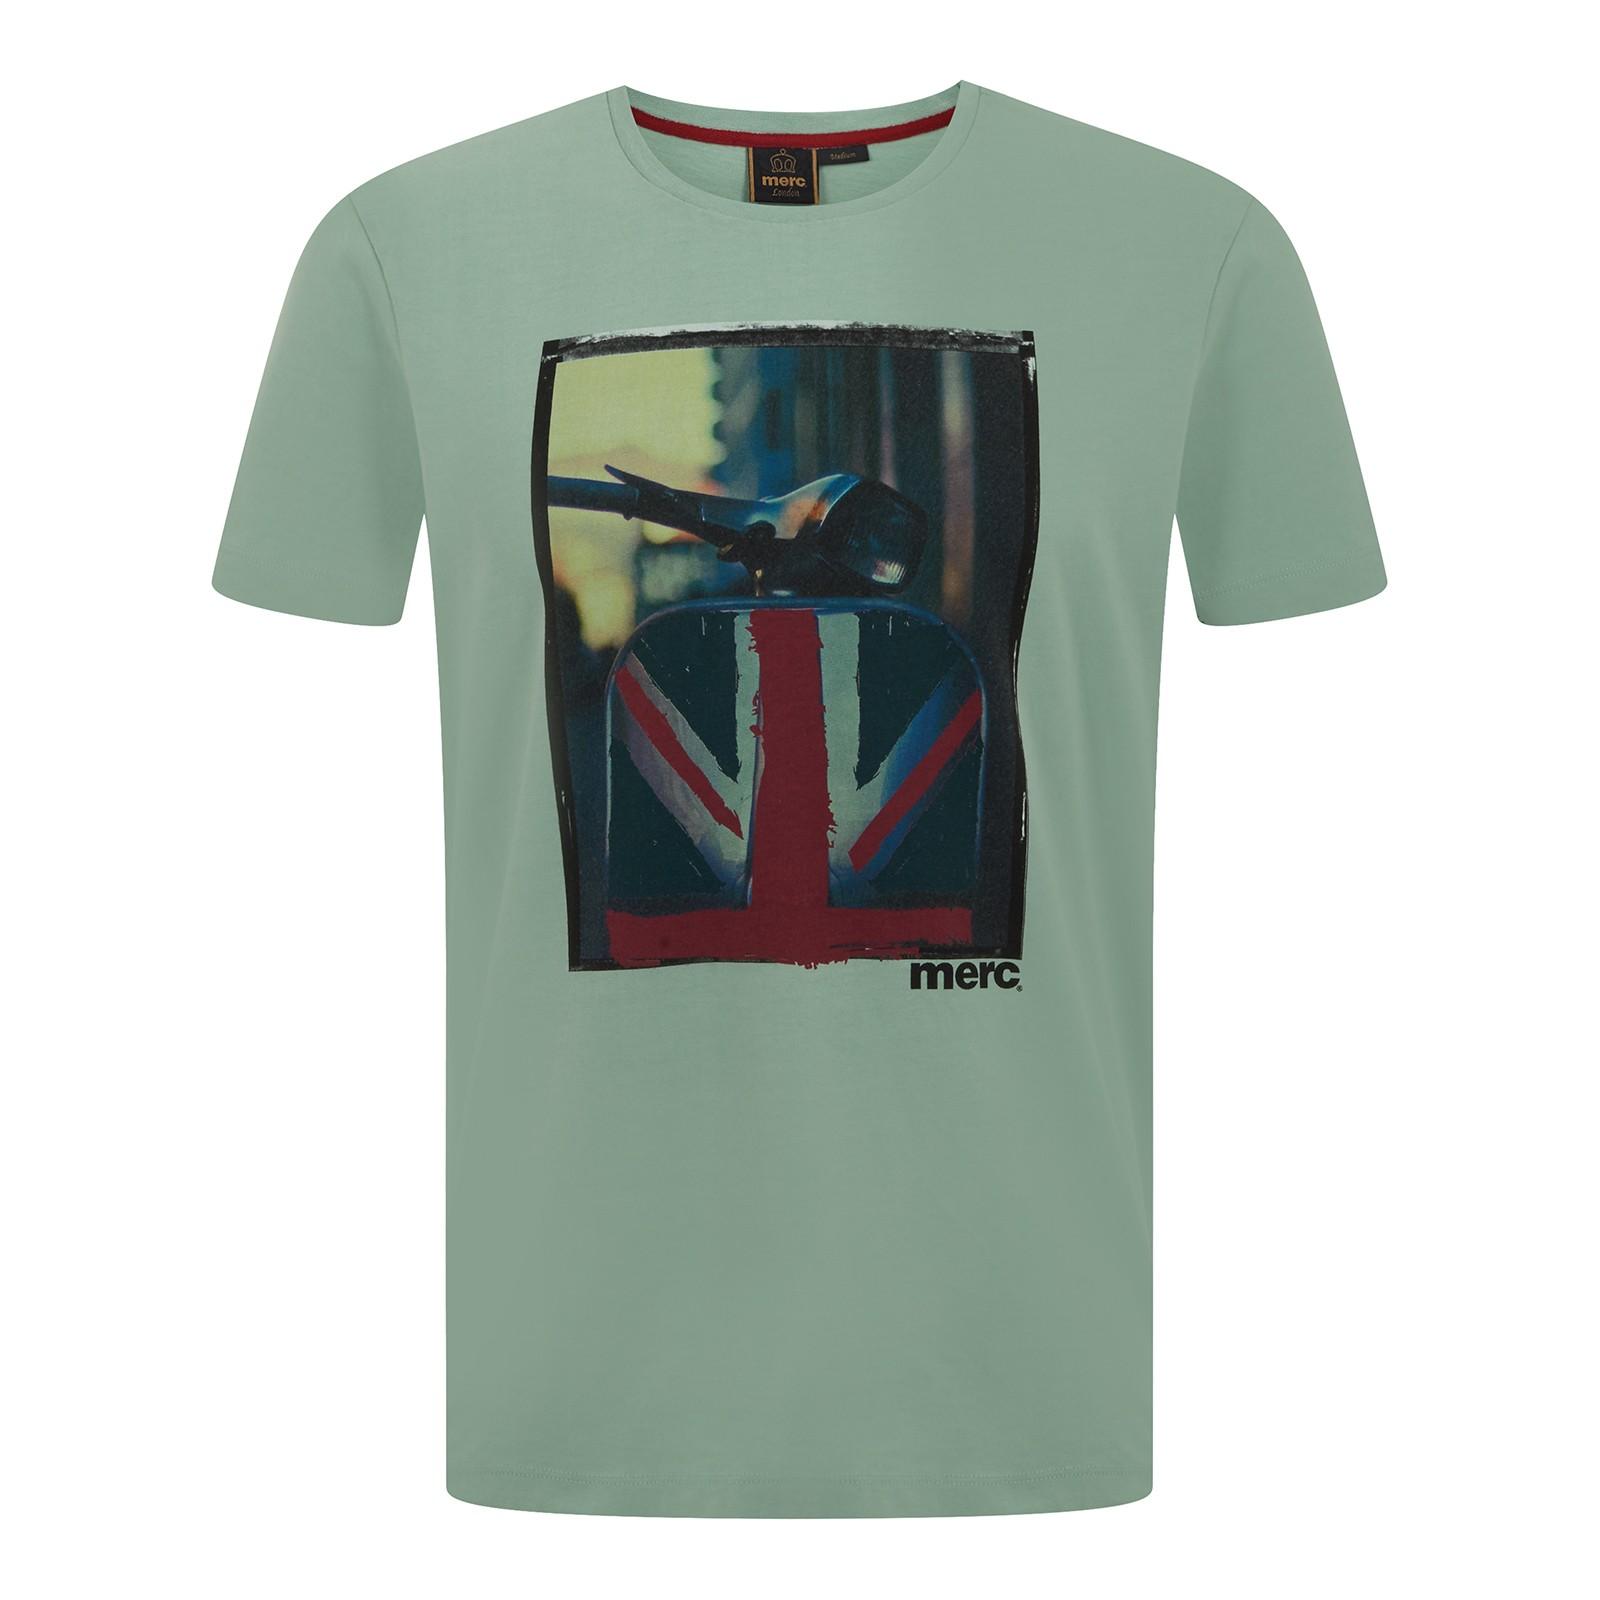 Koszulka MERC LONDON SPINNER T SHIRT, zielona